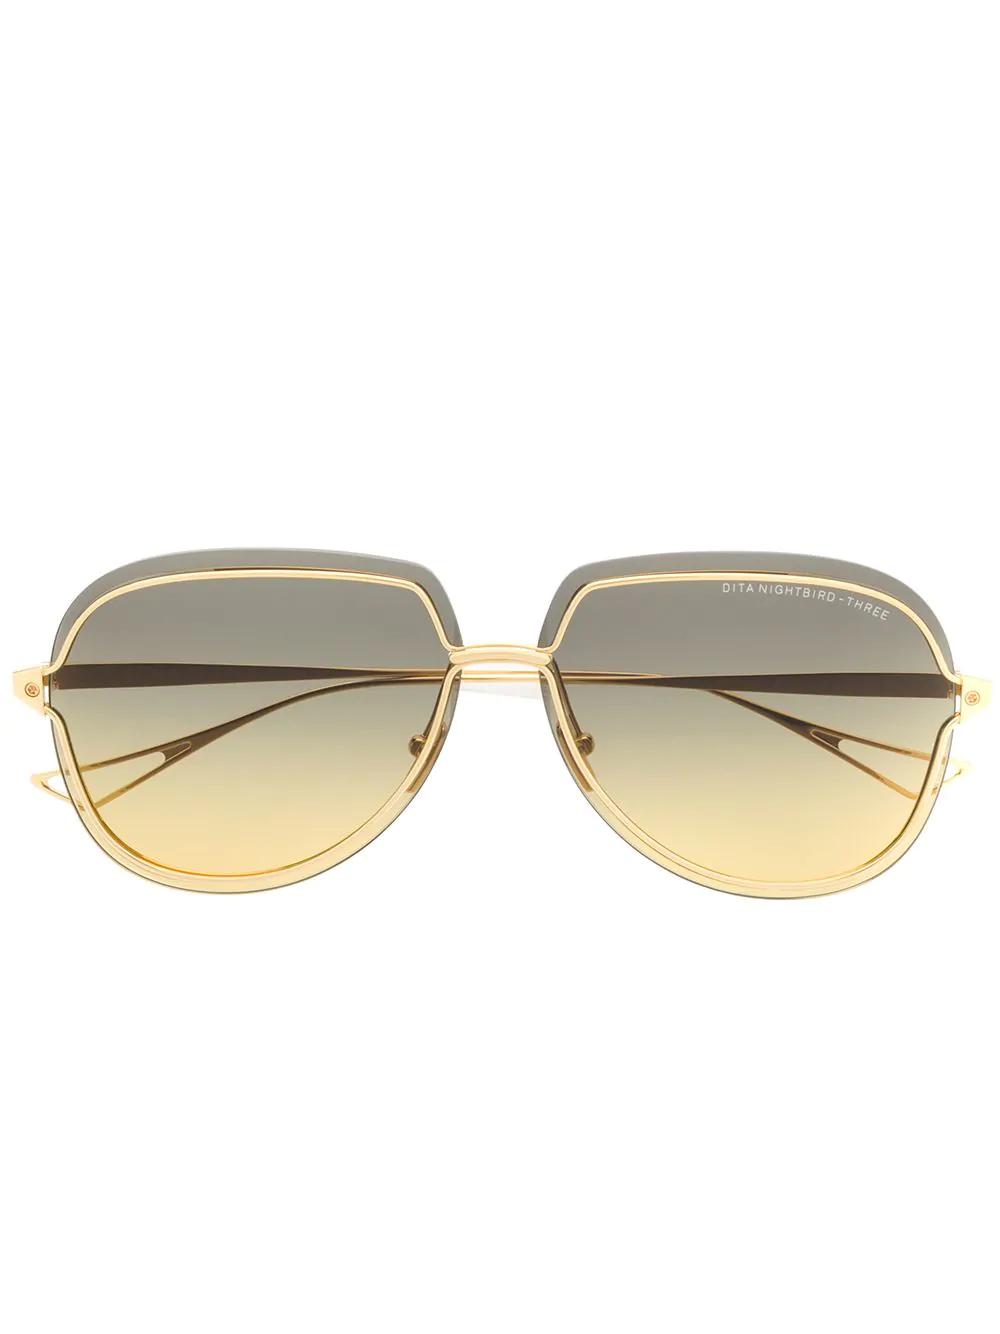 db5605b054 Cartier Aviator Sunglasses - Metallic